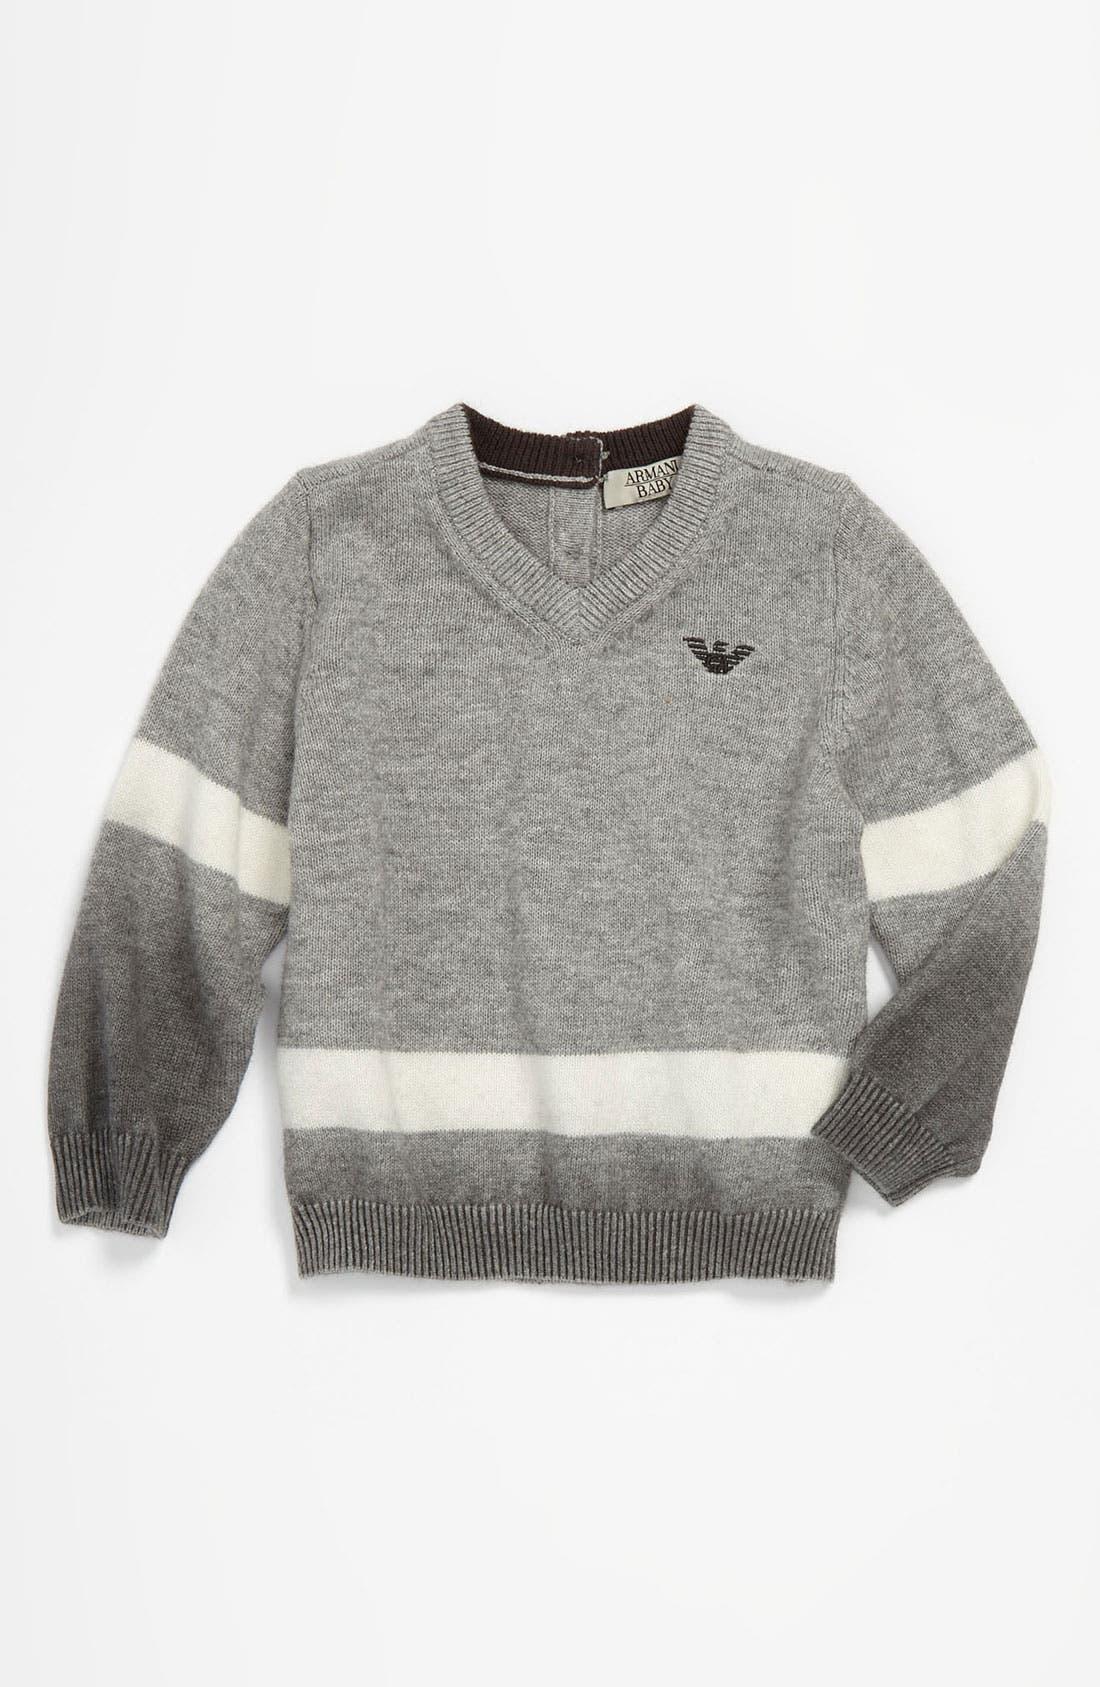 Alternate Image 1 Selected - Armani Junior Ombré Sweater (Infant)